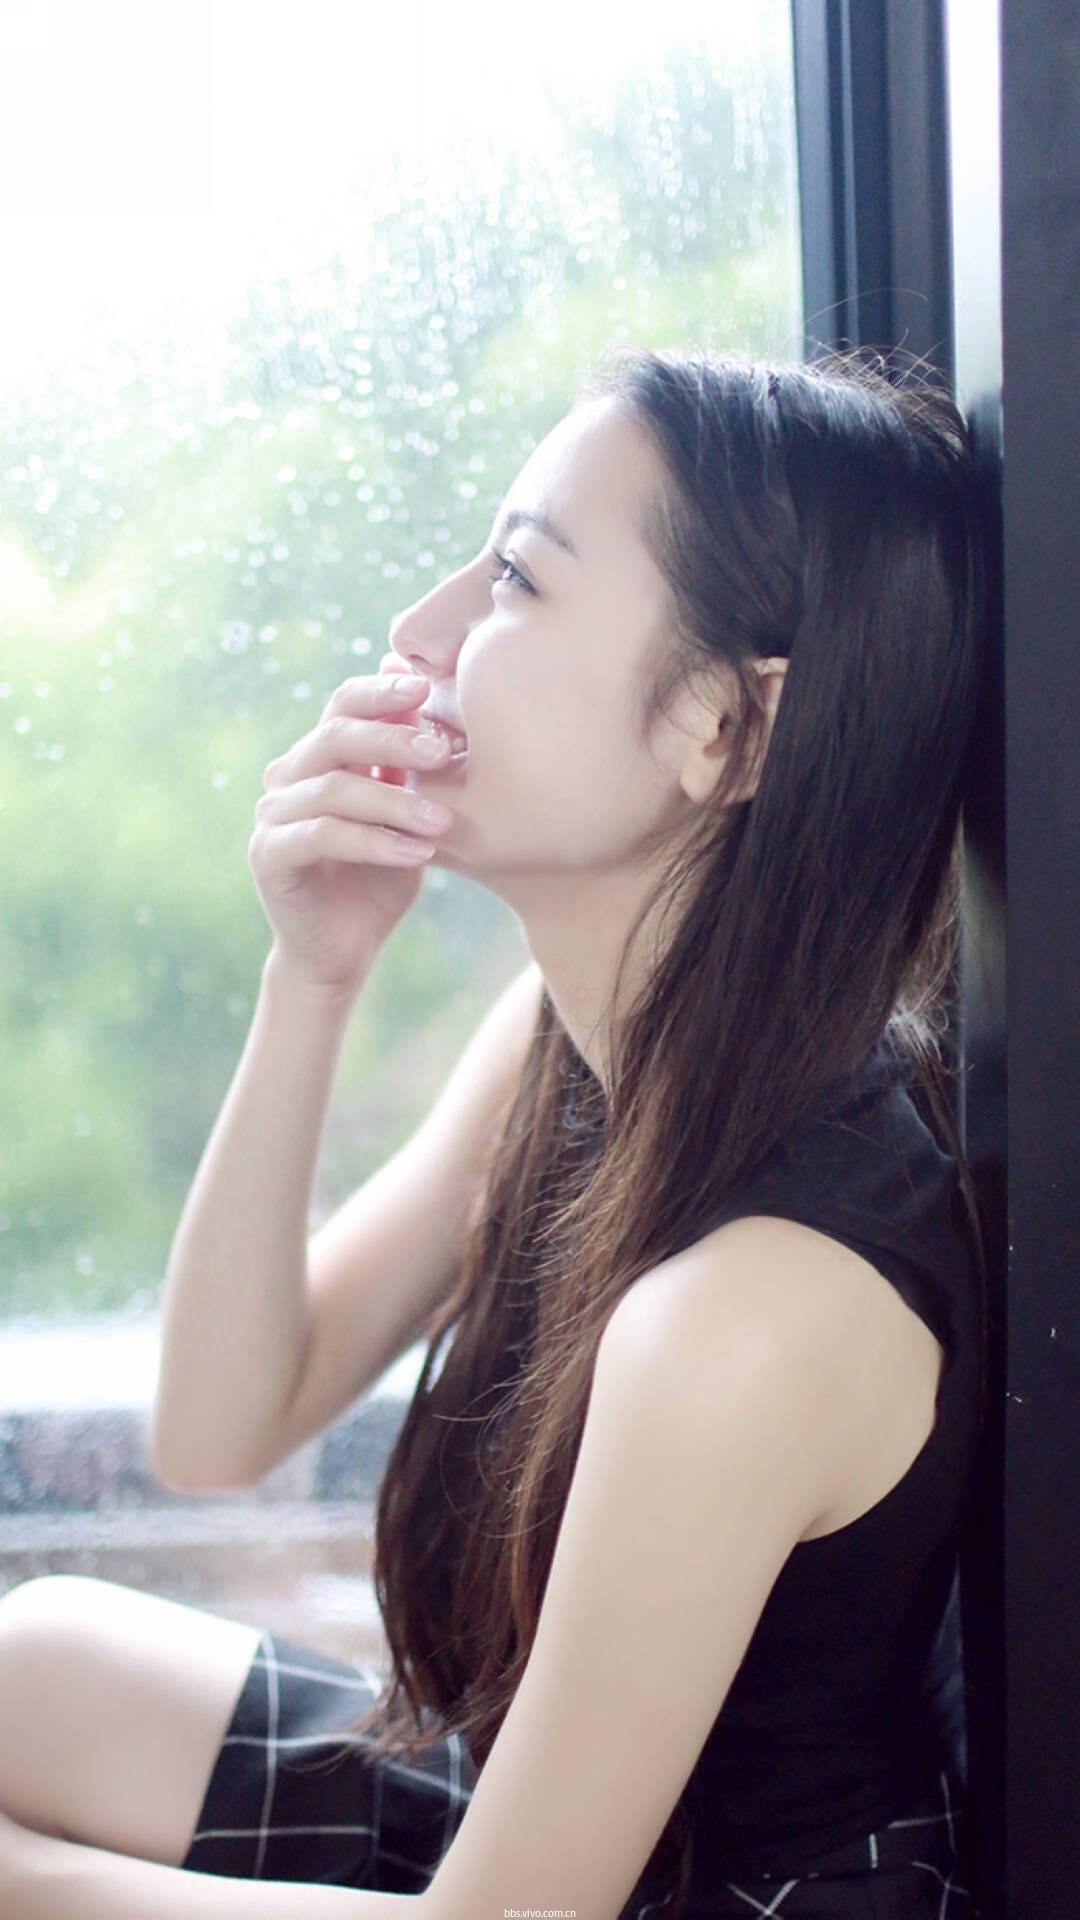 【v粉主题素材壁纸】人气女星迪丽热巴7p-手机主题-v